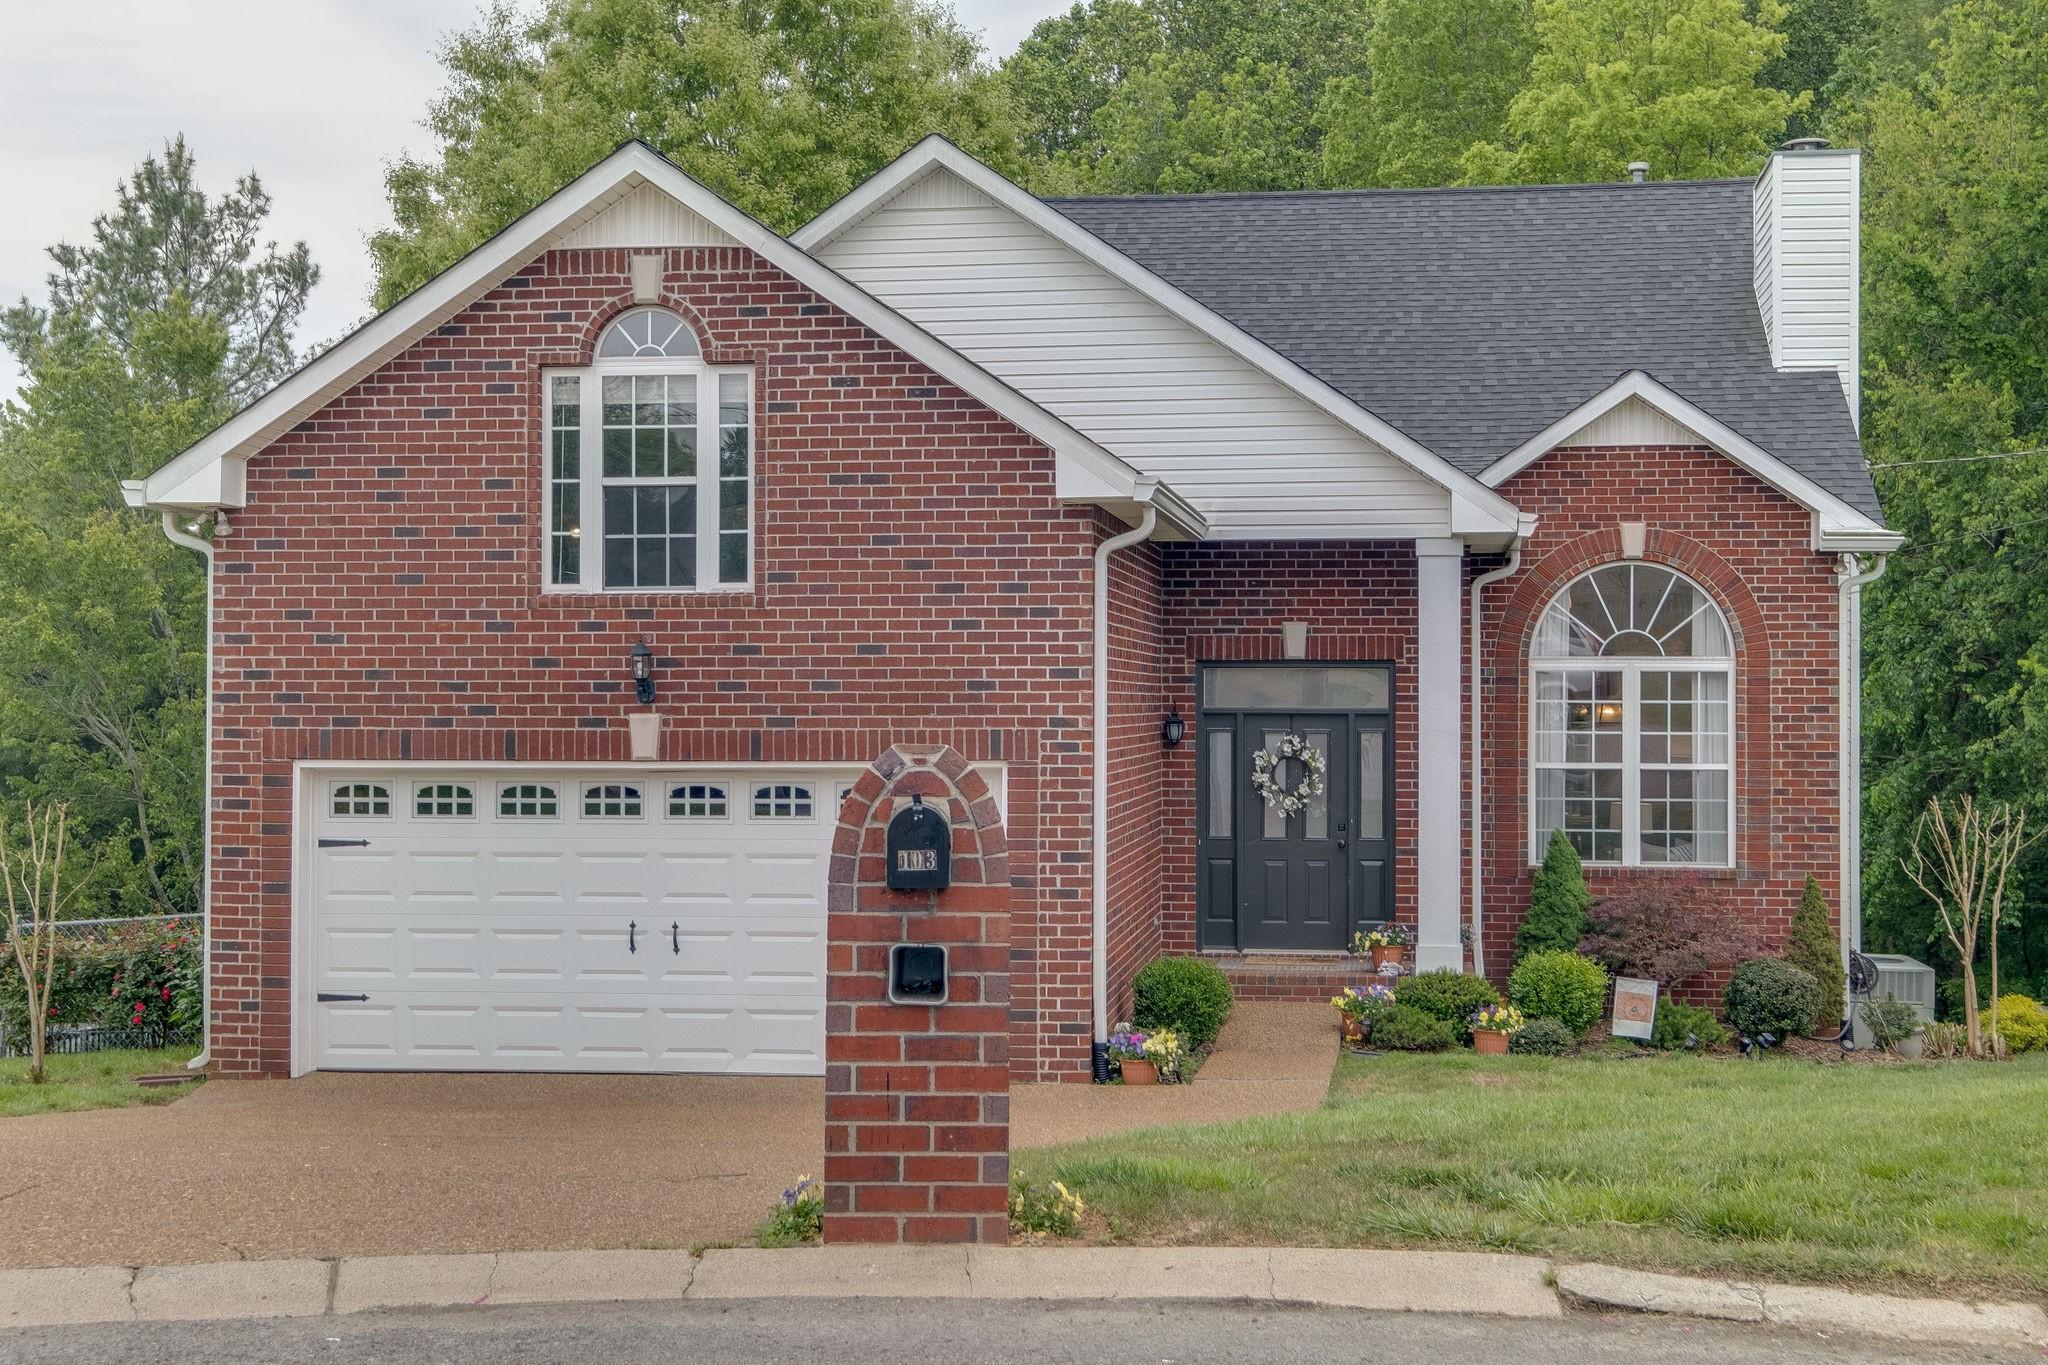 103 Cherokawa Ct, White House, TN 37188 - White House, TN real estate listing